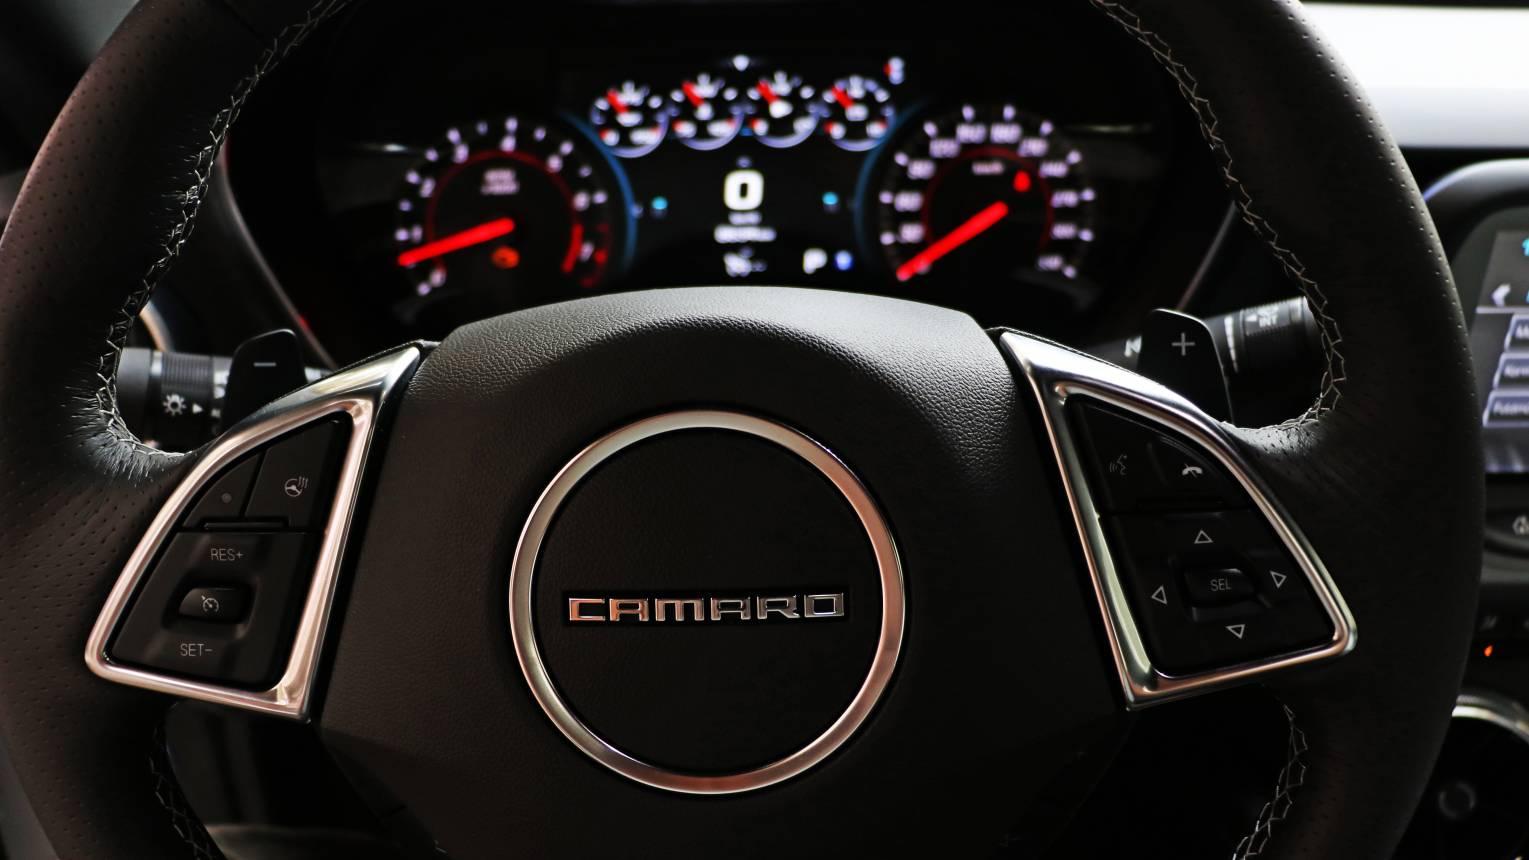 Űrdongóval Camaro taxi